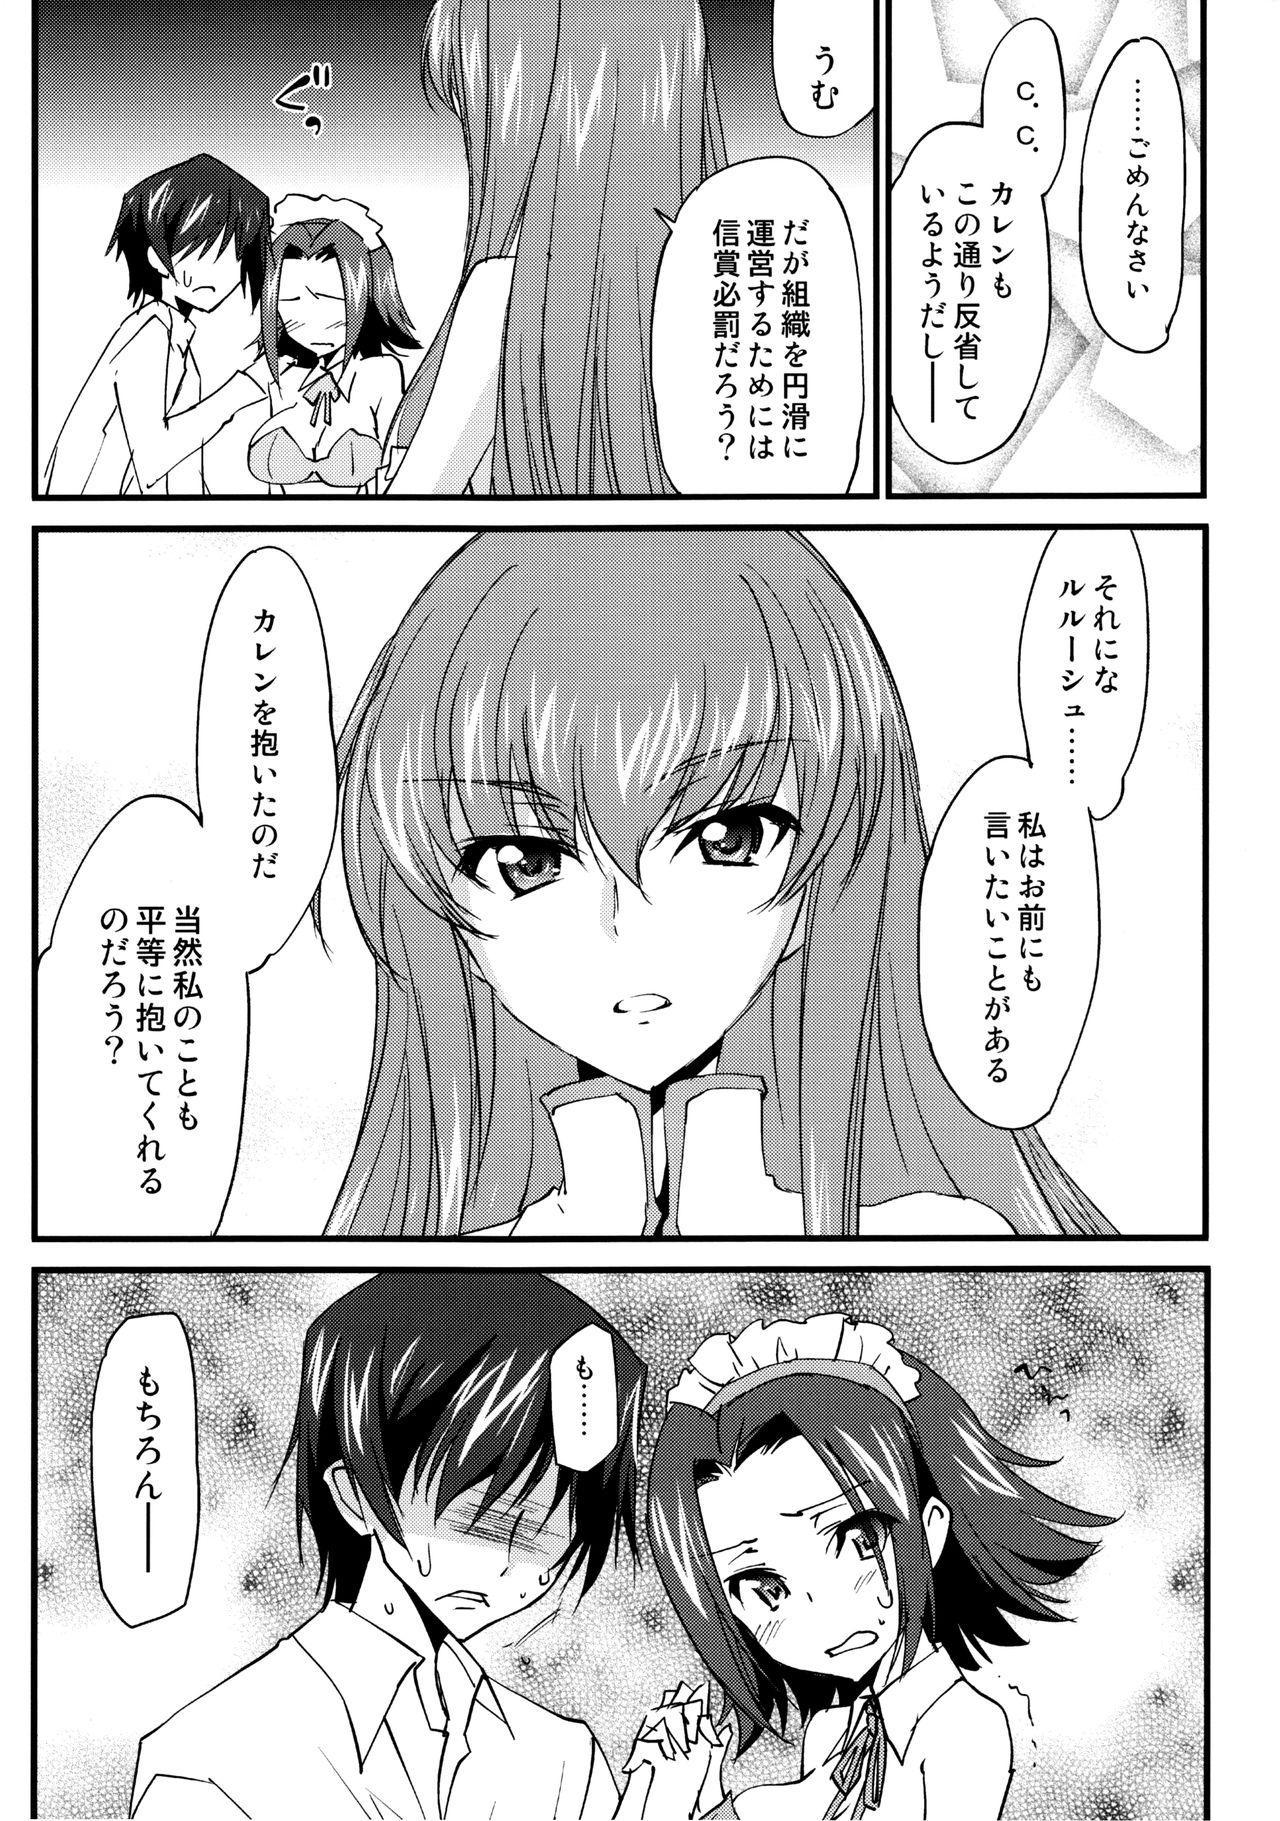 (C90) [Homura's R Comics (Yuuki Homura)] Oshioki Kallen-chan -C.C. Hen- (Code Geass) 3